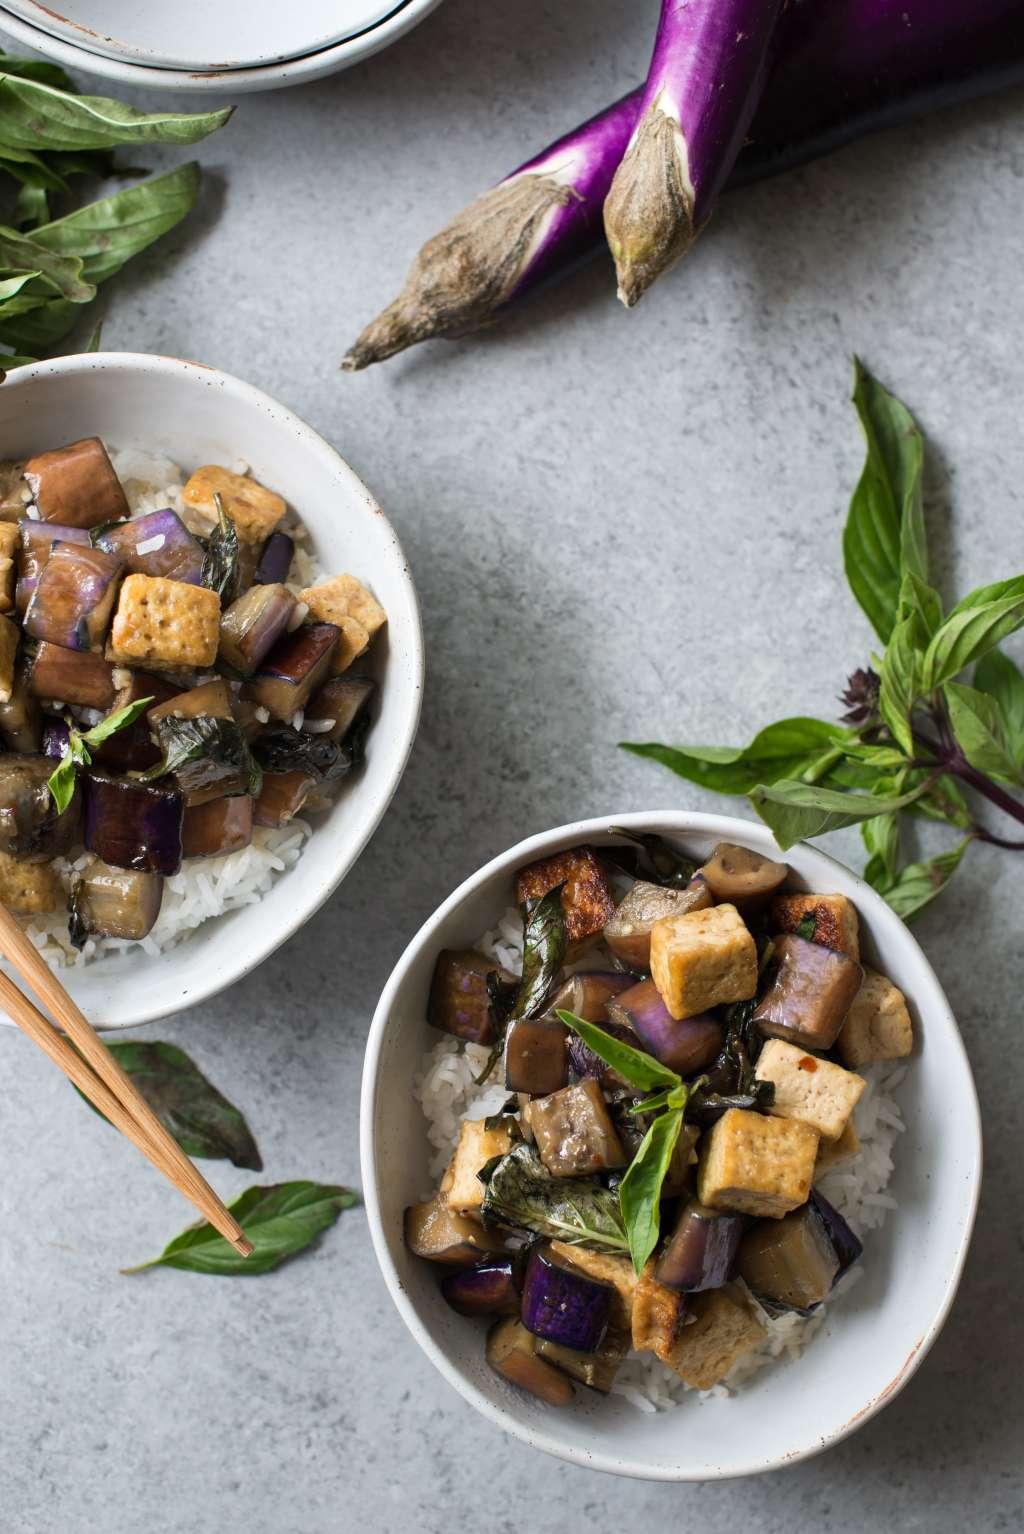 Recipe: Vegan Stir-Fried Garlic Tofu and Eggplant